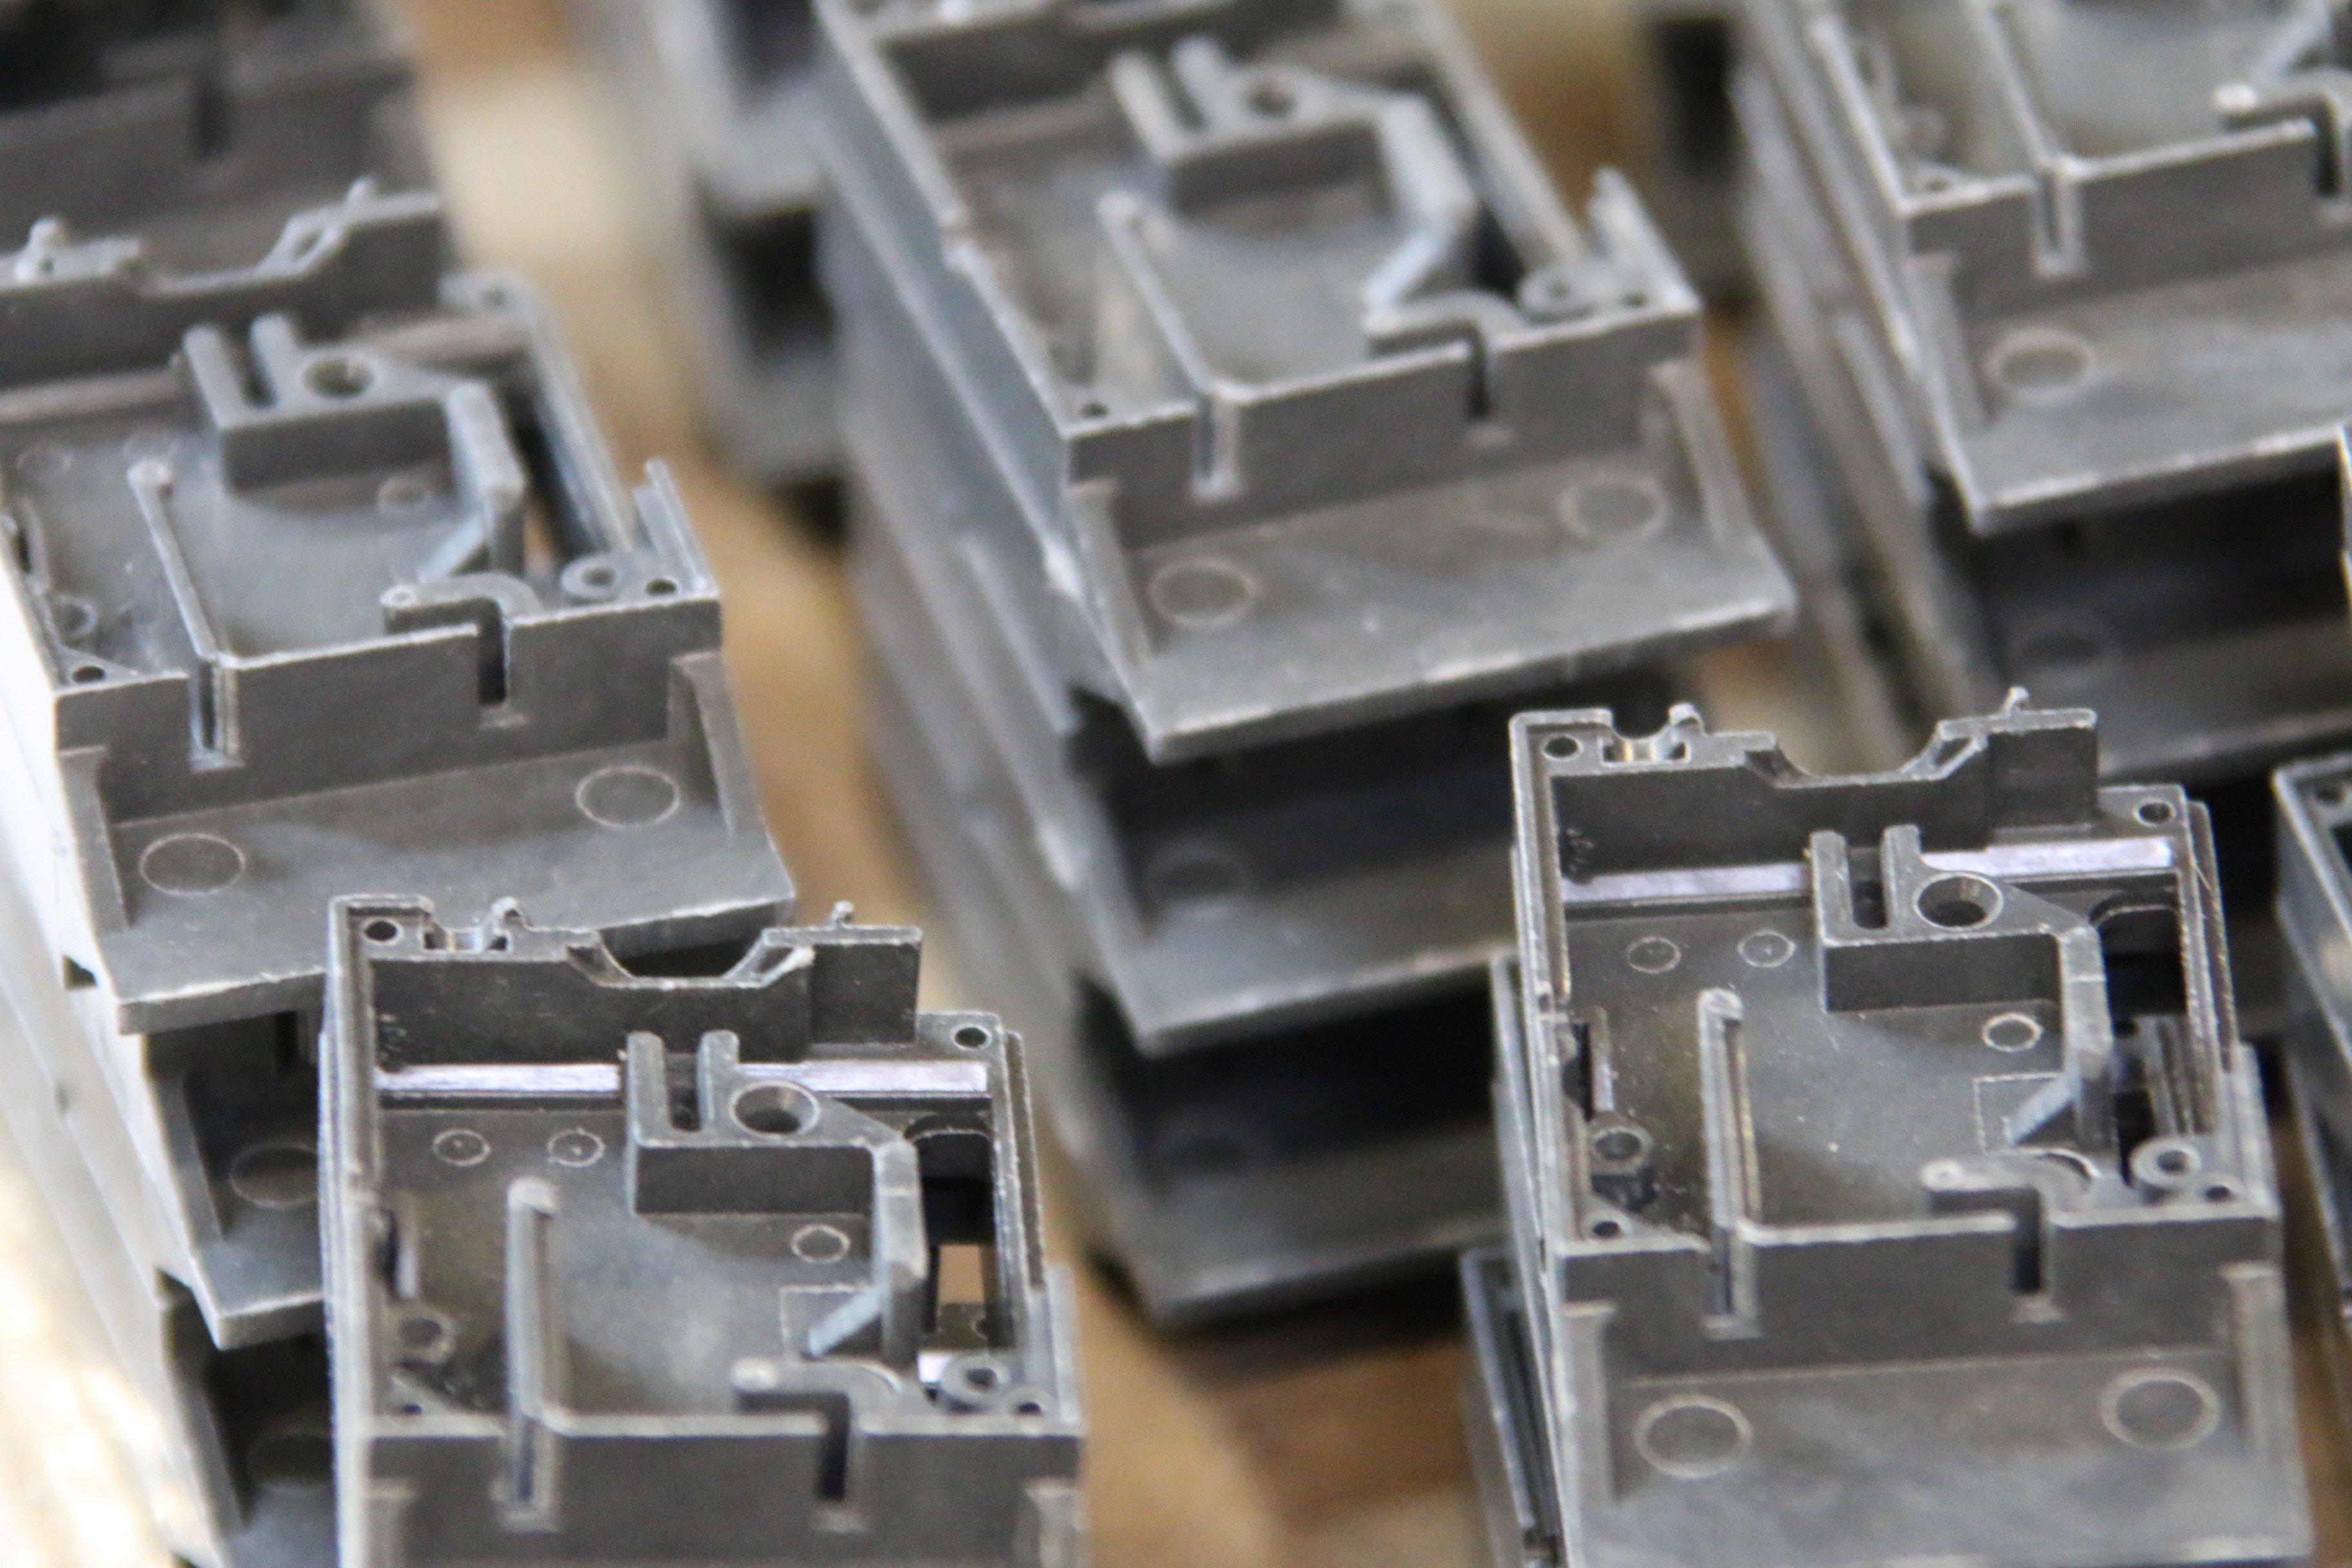 Thermoset molding - sheet molding